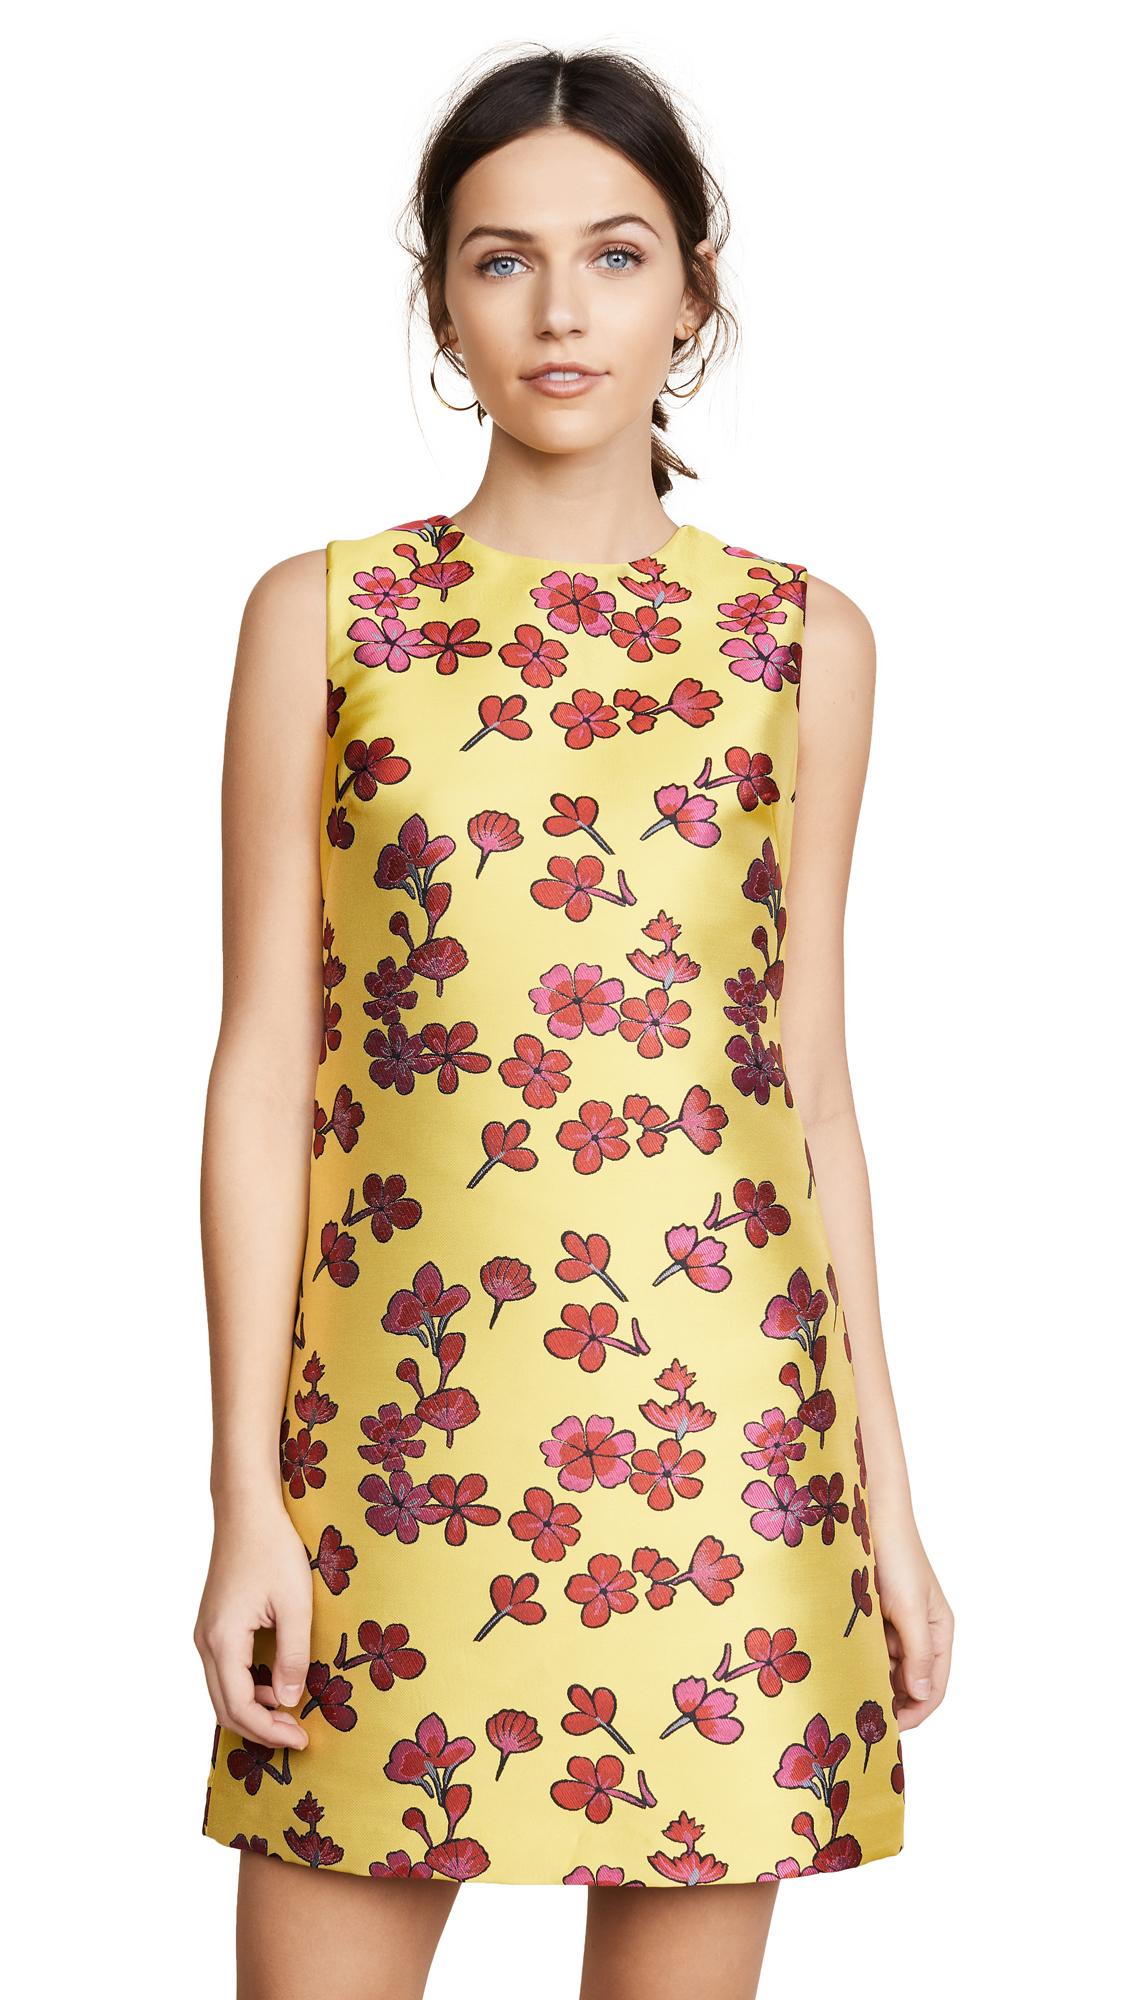 alice + olivia Coley Dress - Sunflower/Poppy